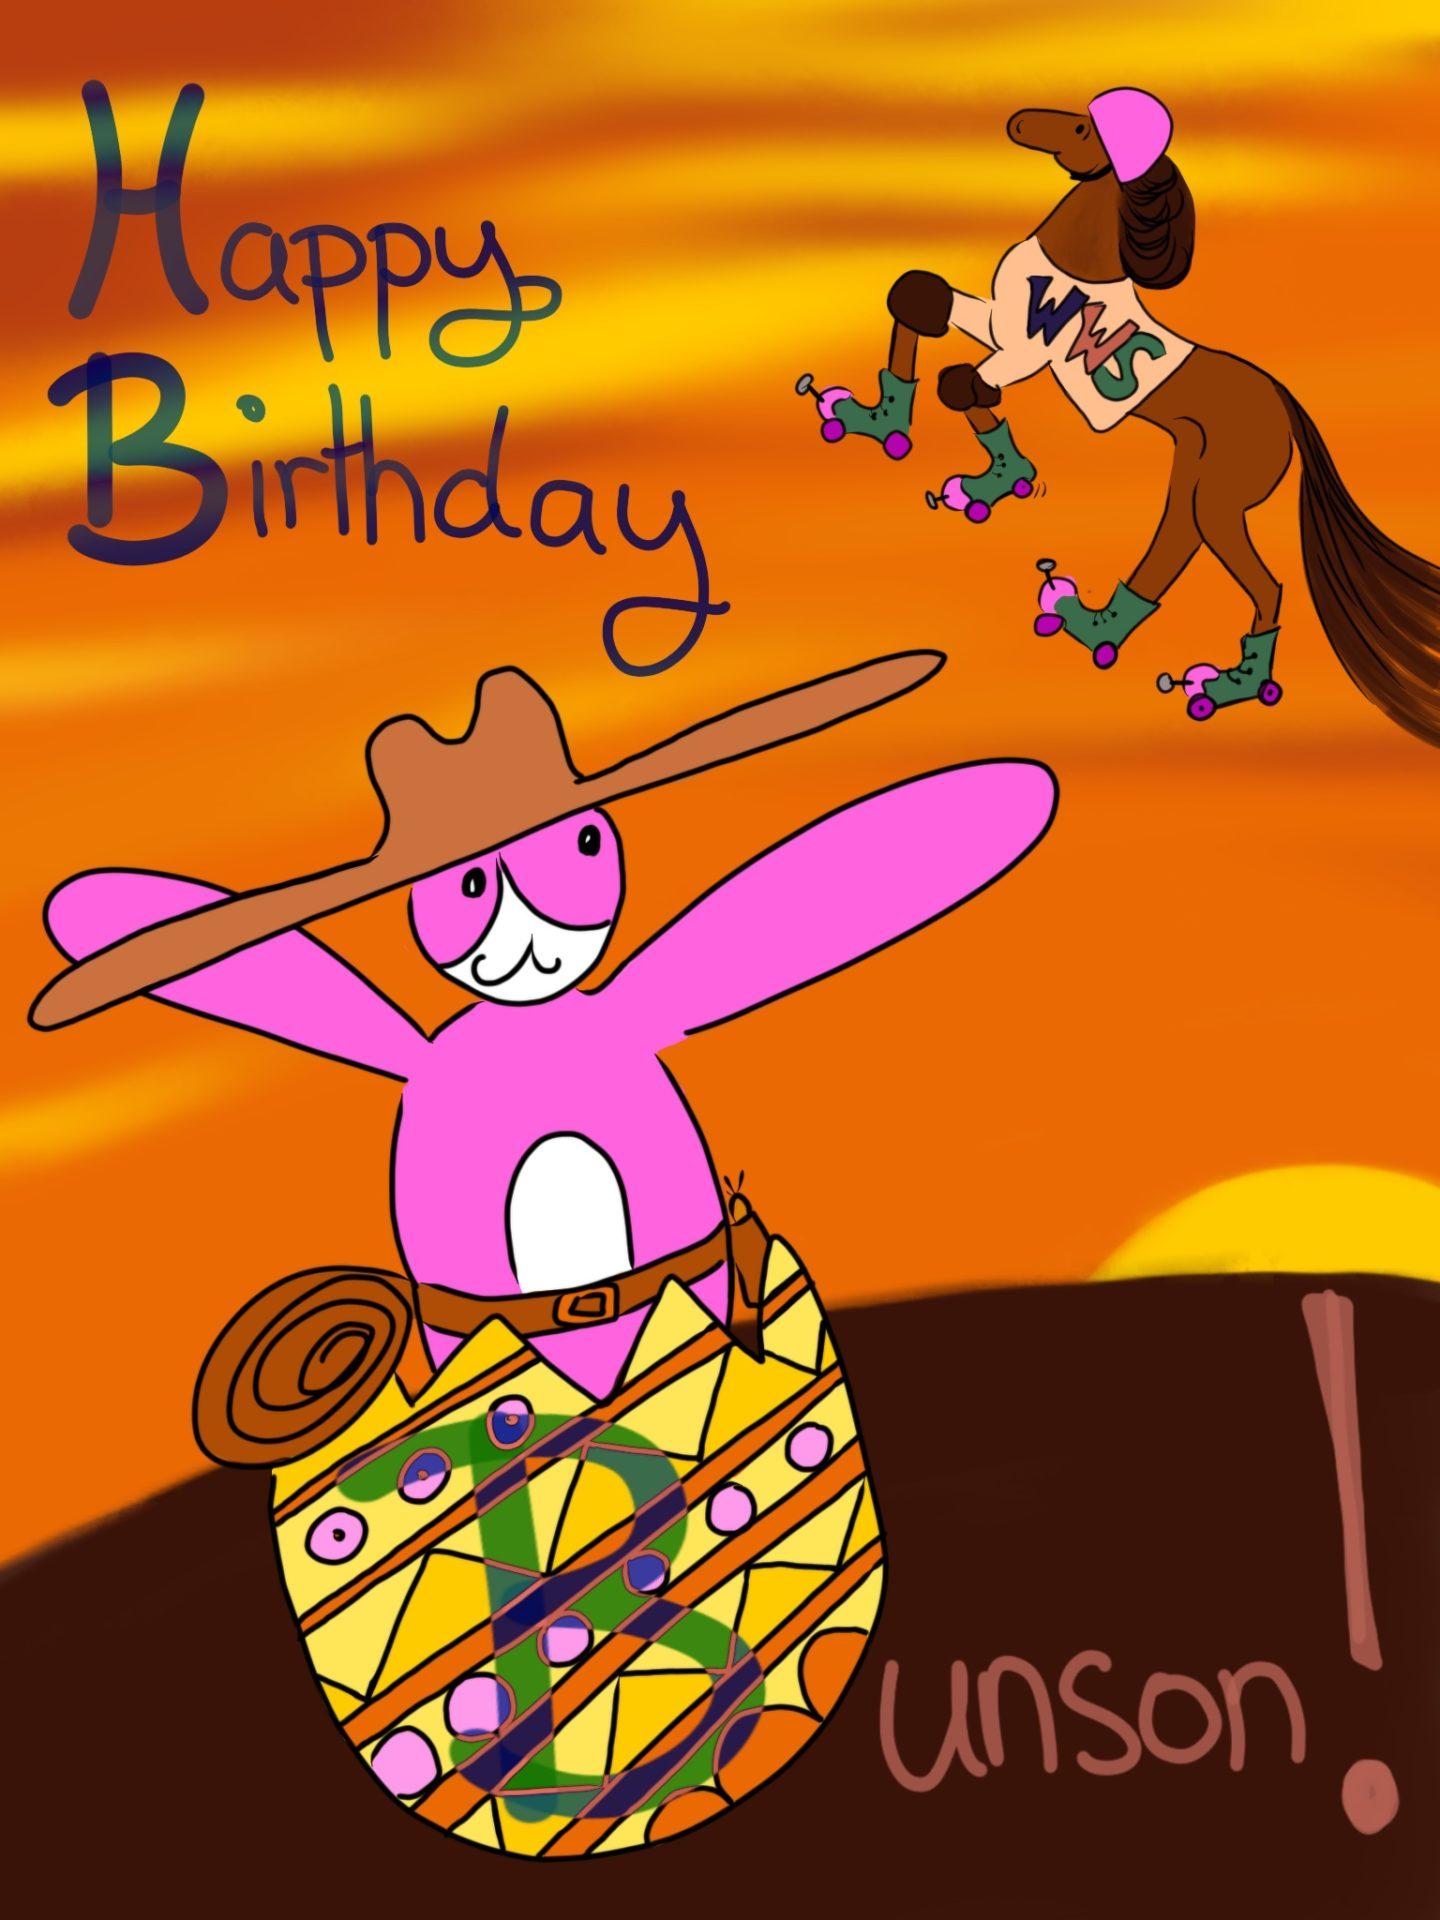 381: Happy Birthday Bunson!